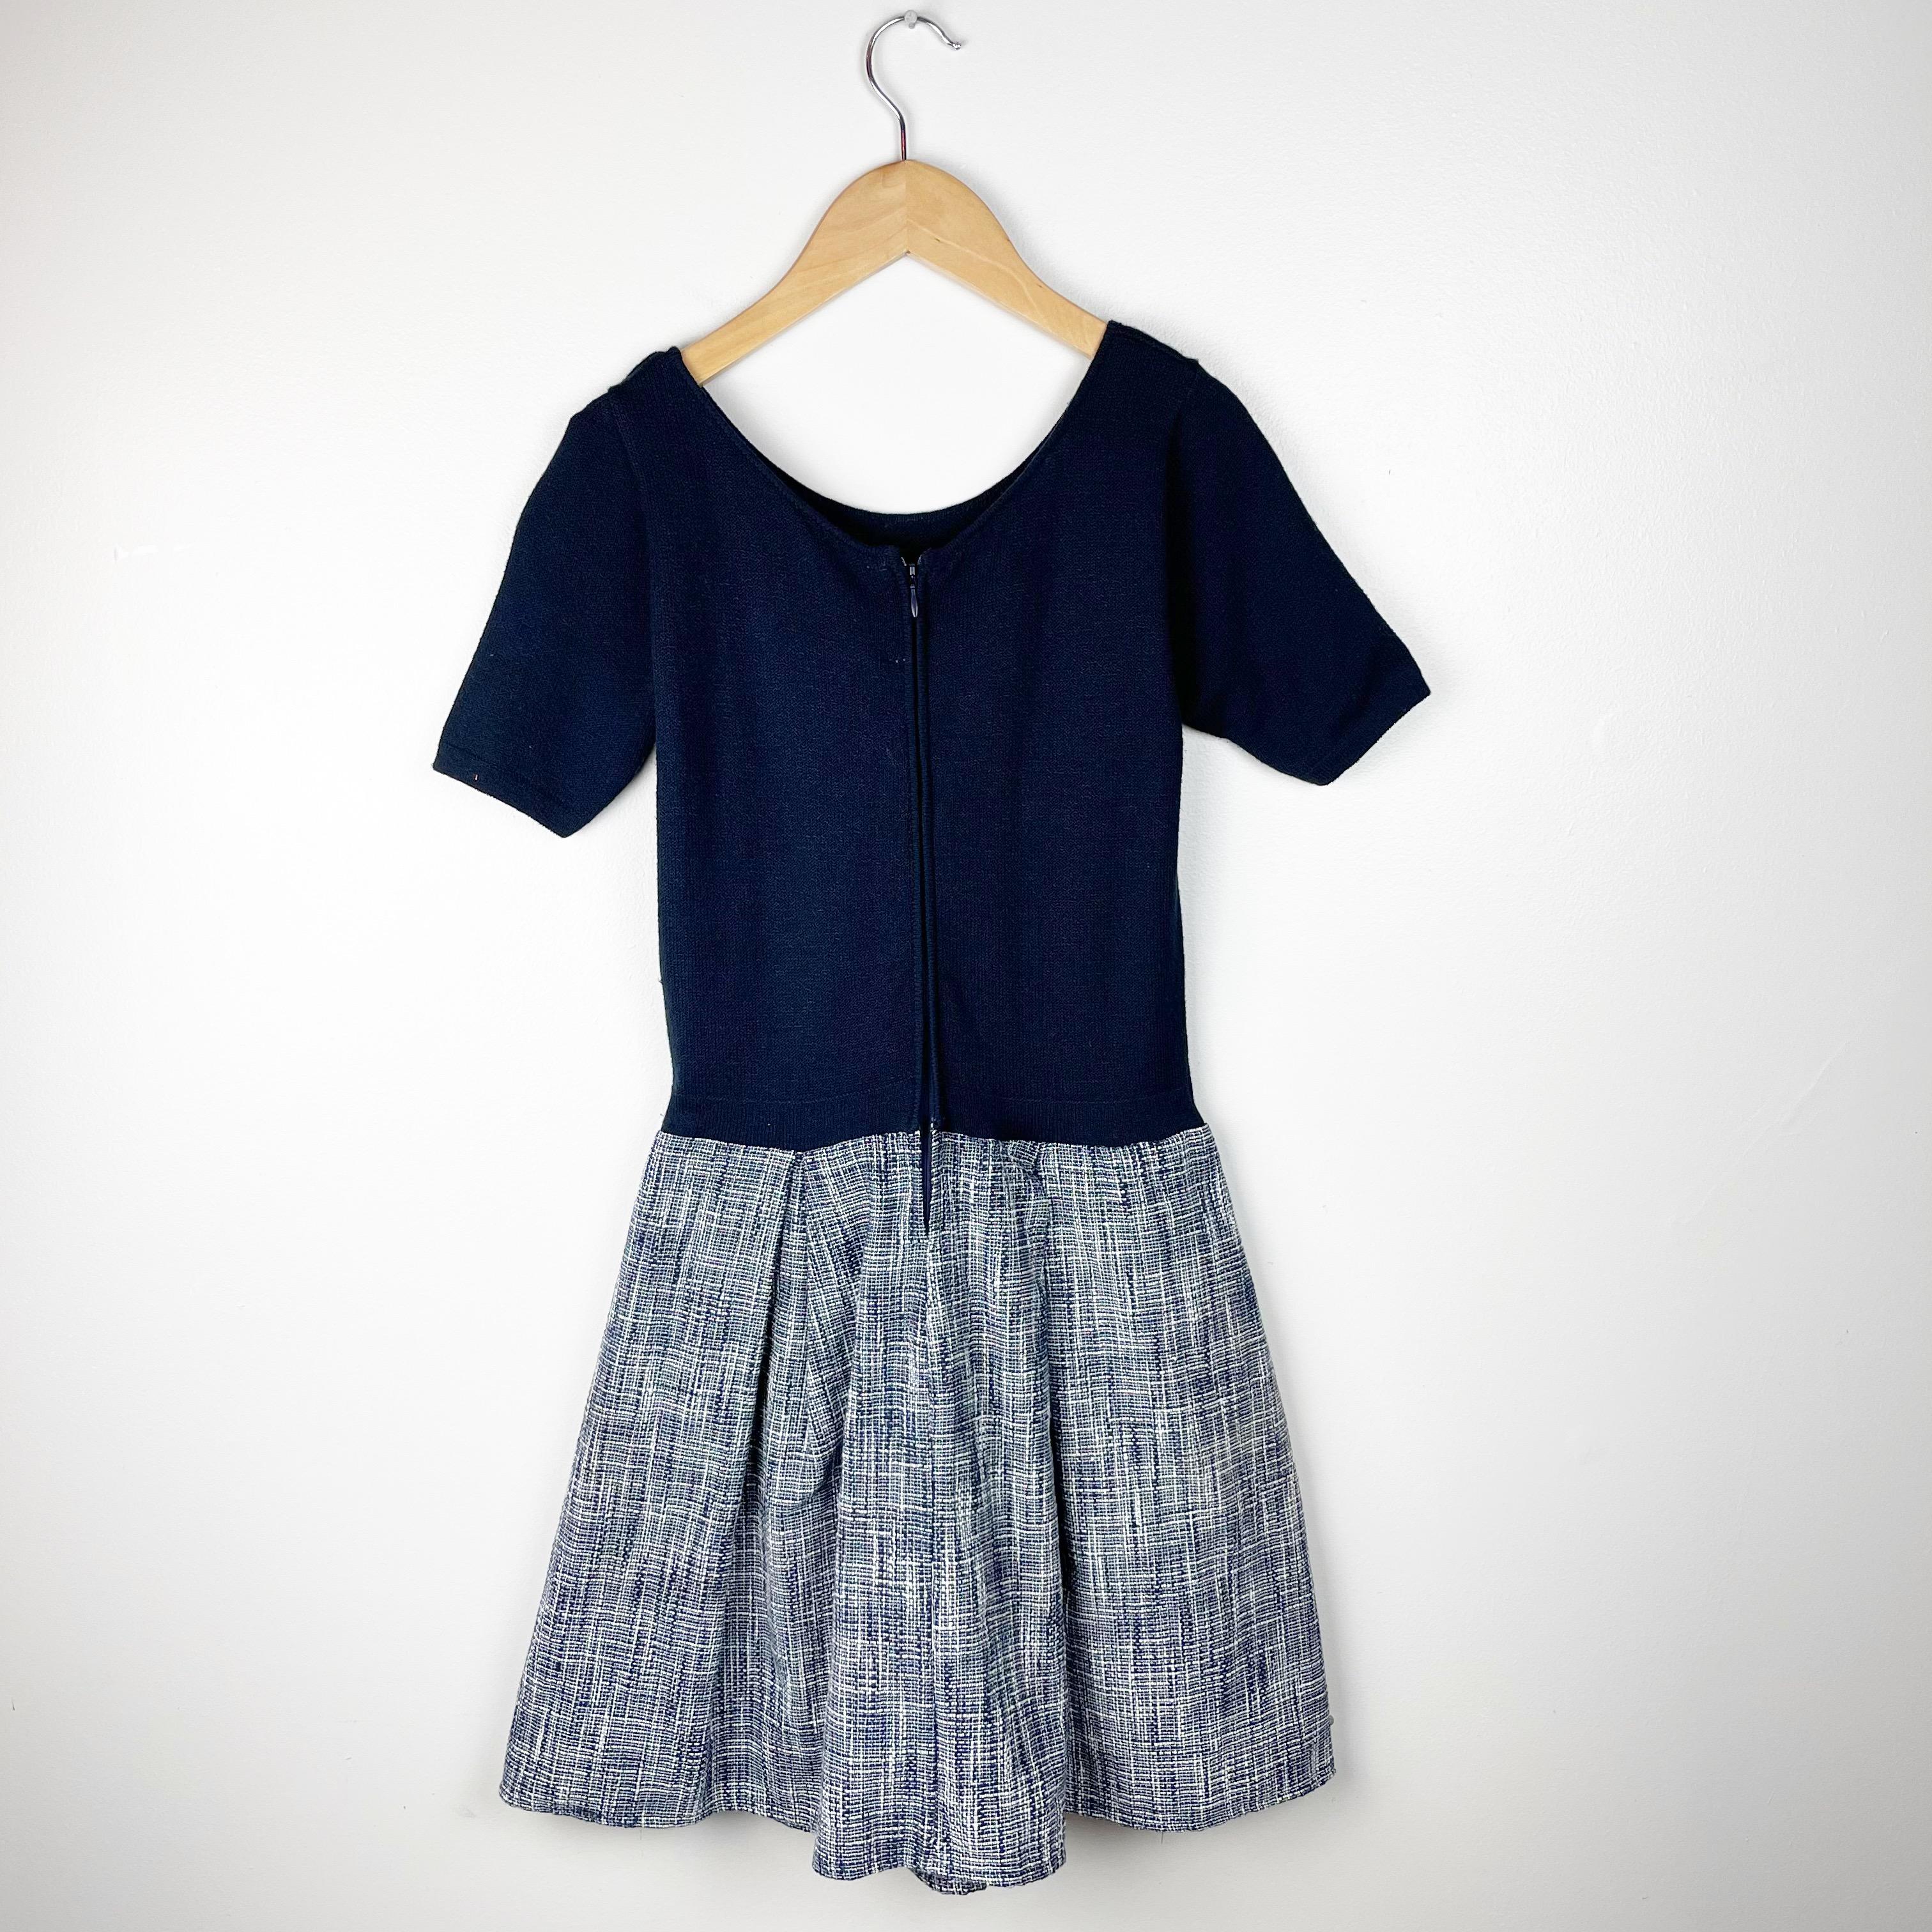 Marina Cabrera 12 Dresses